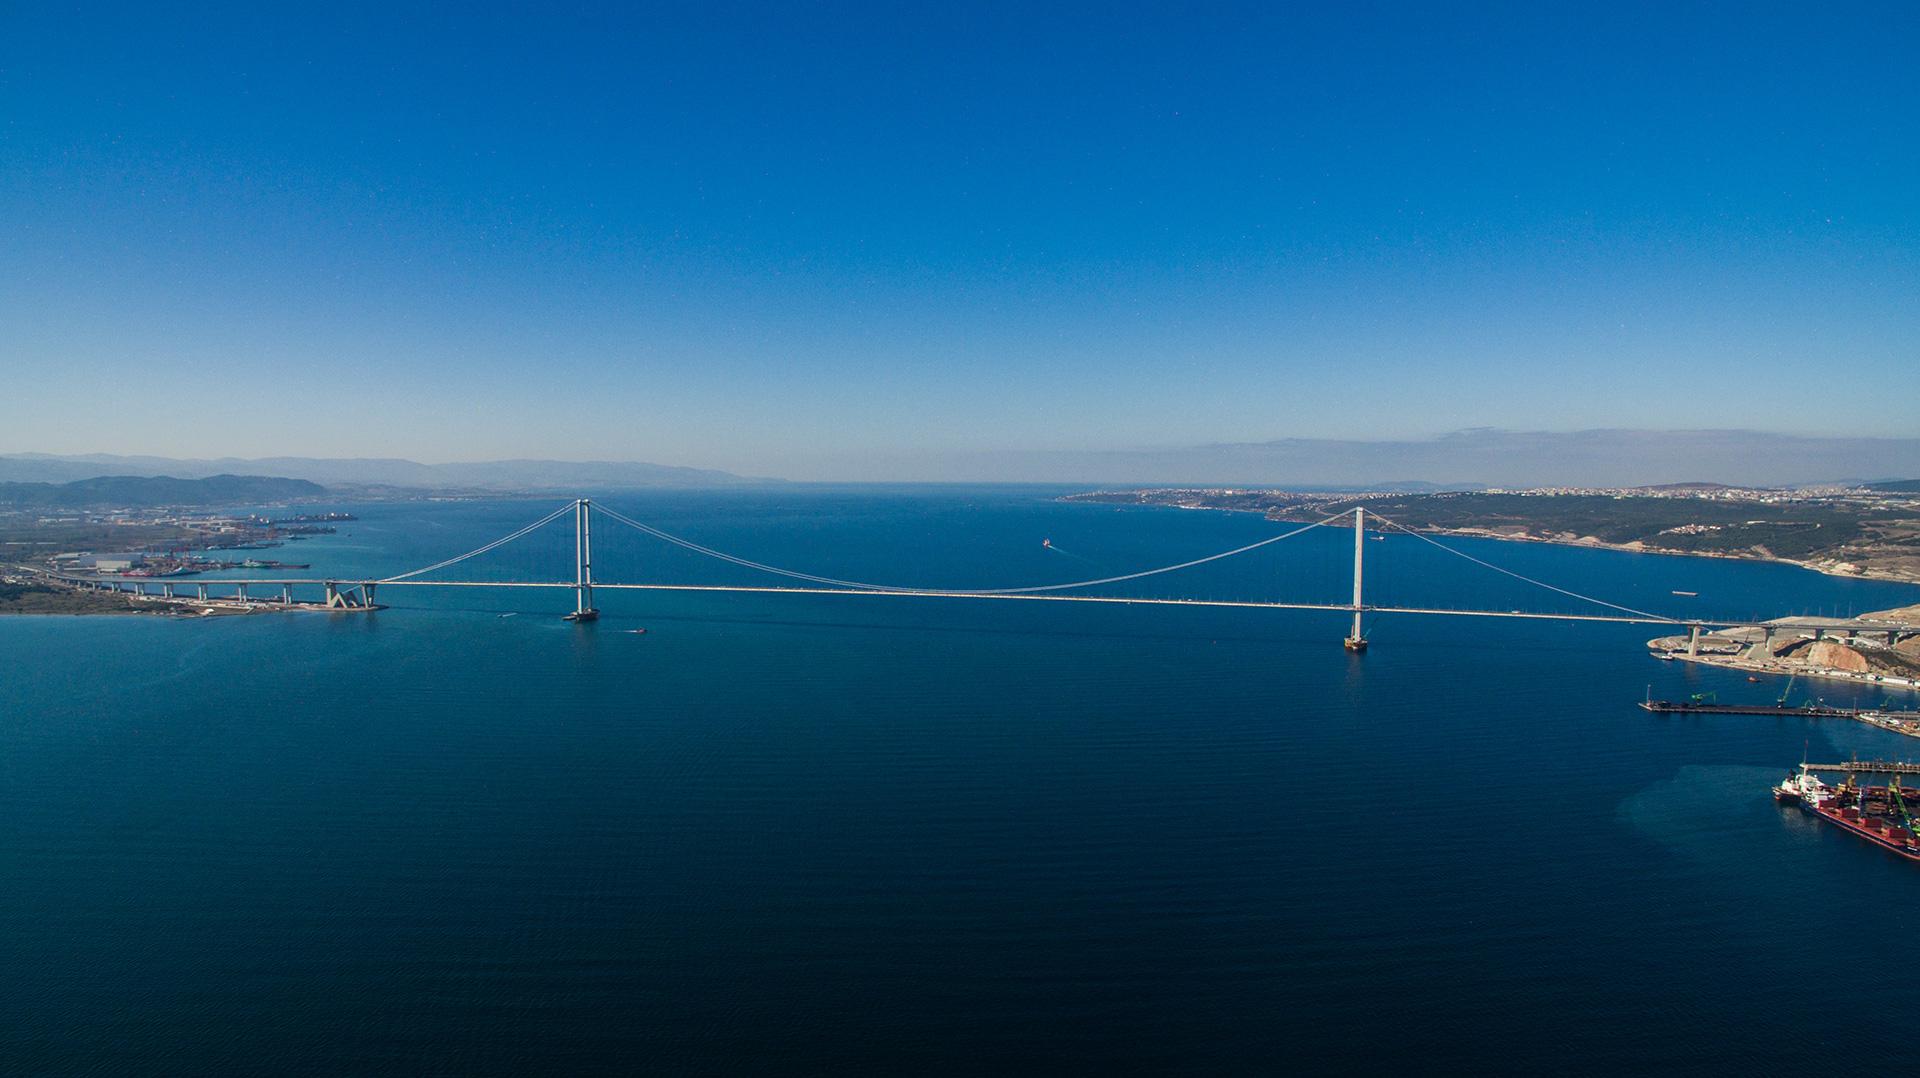 Proyecto de puente osmangazi